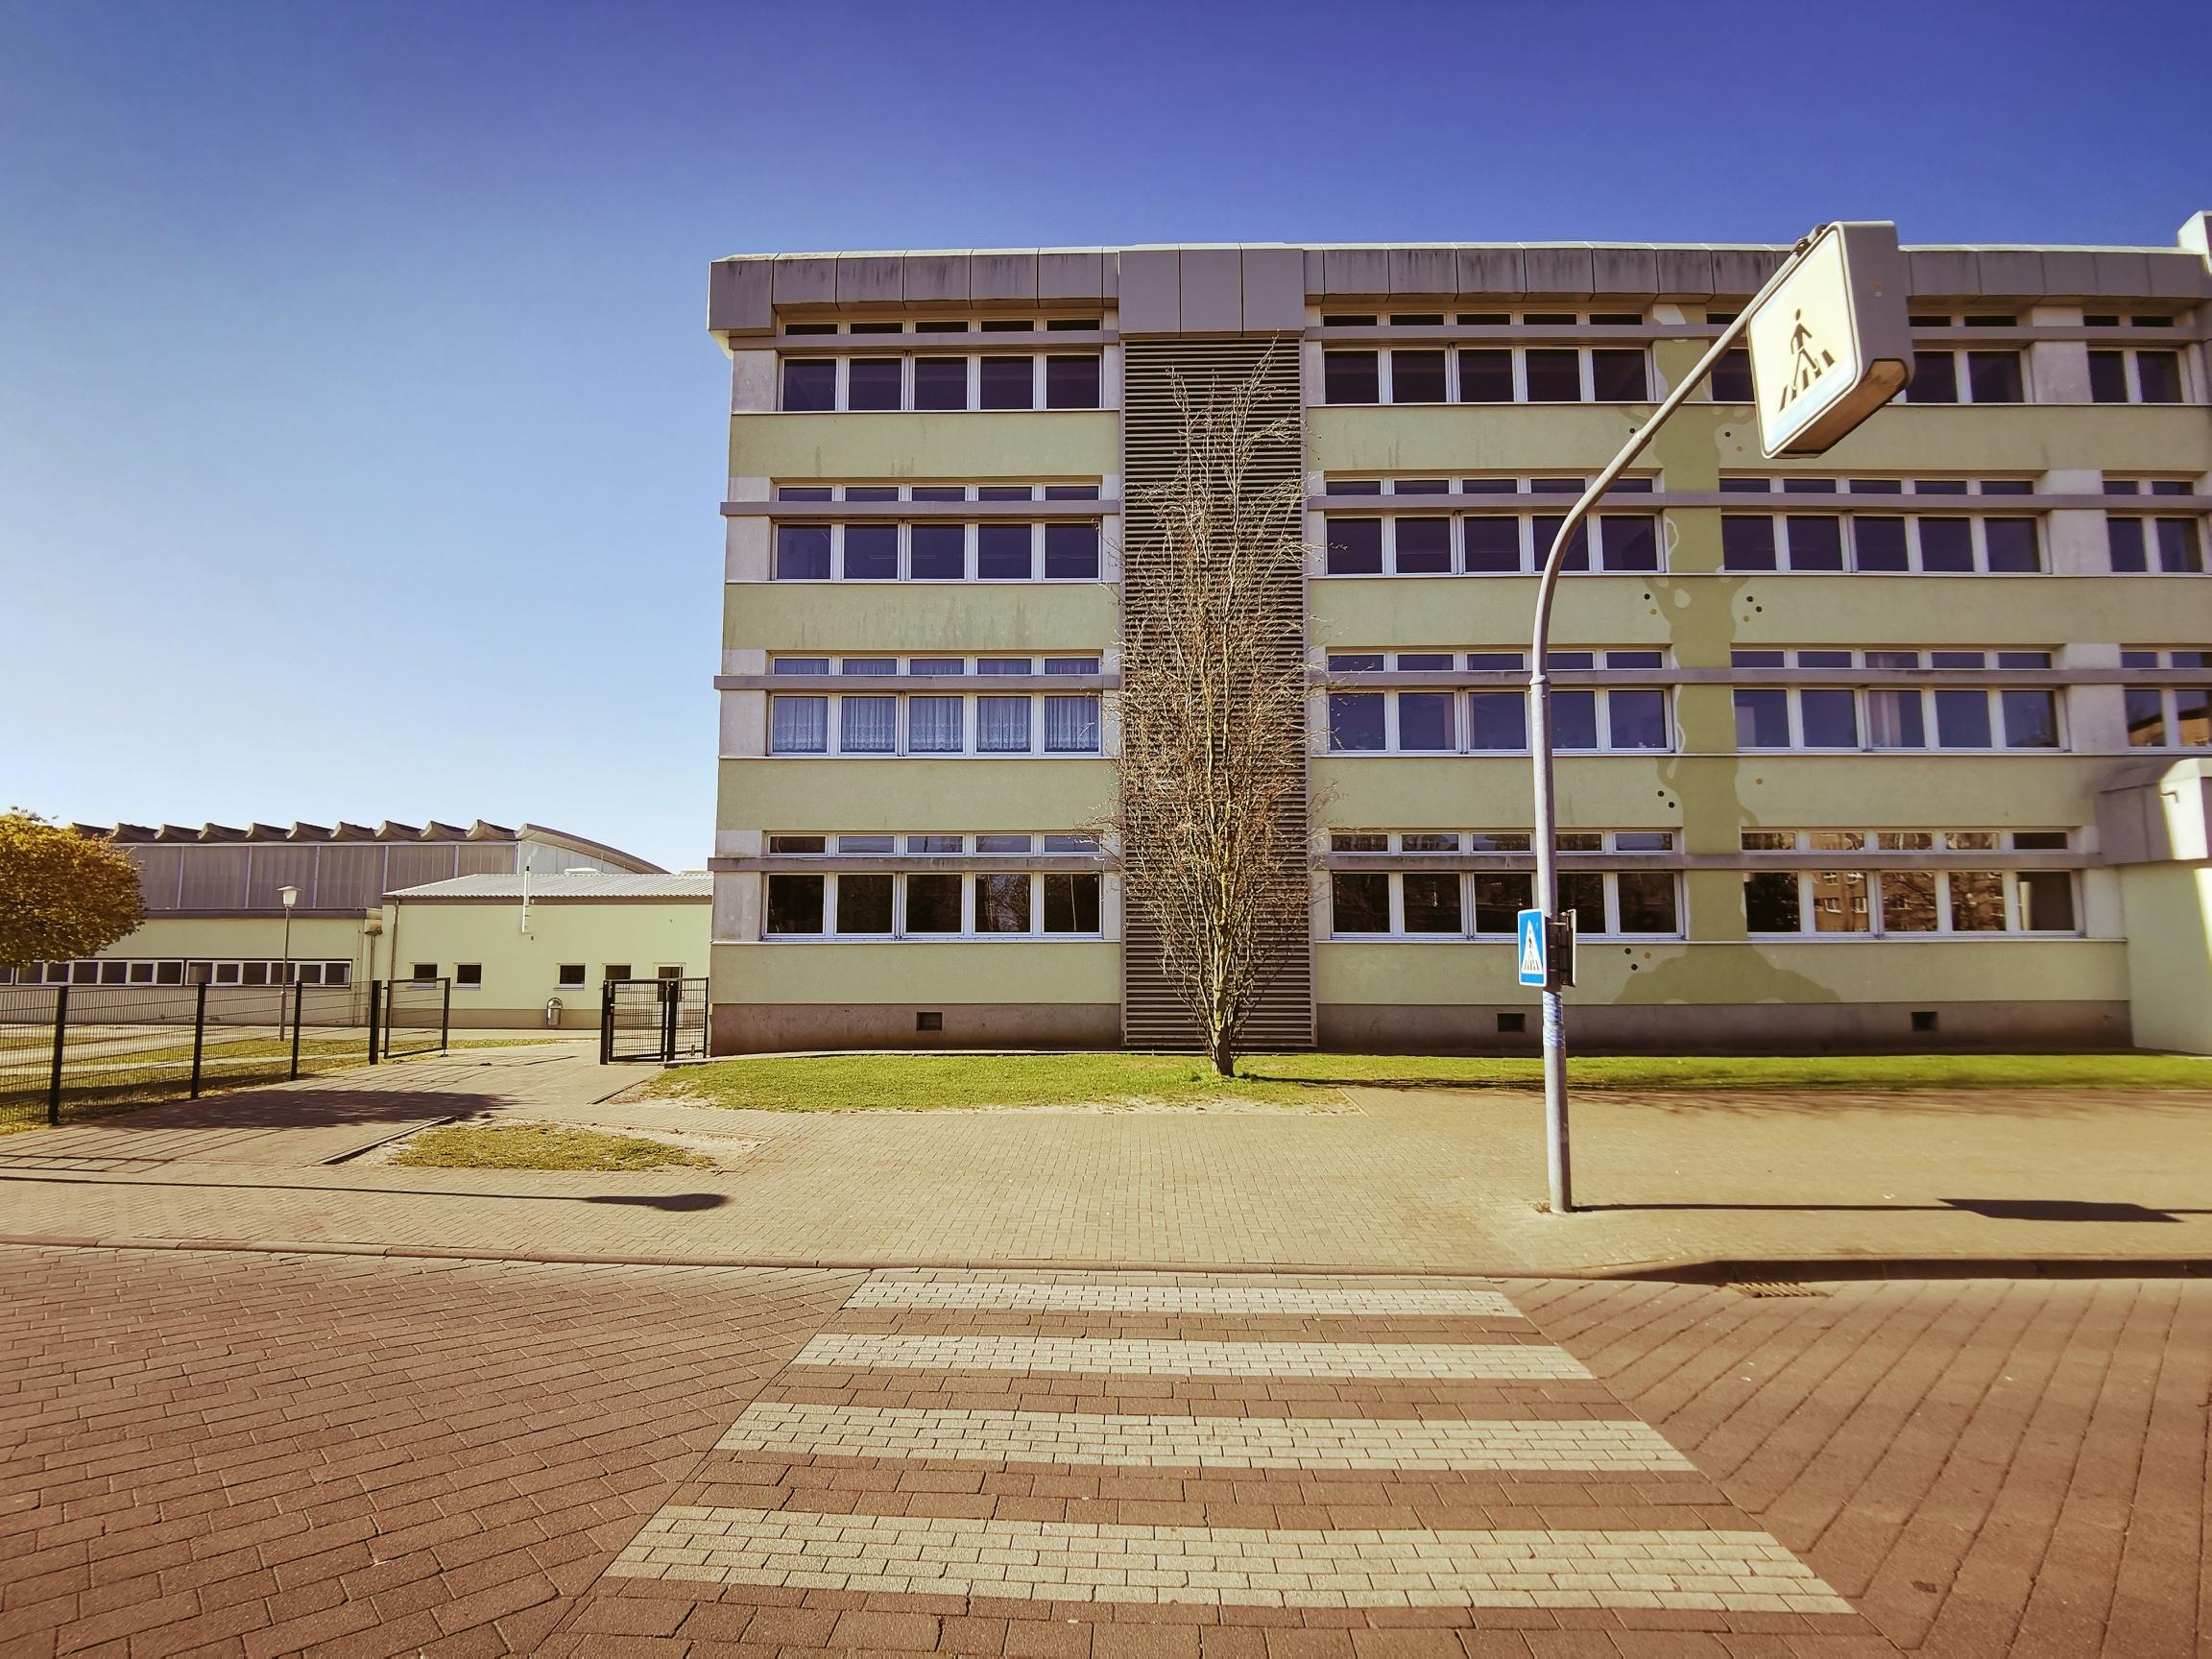 Rochow Schule Pritzwalk